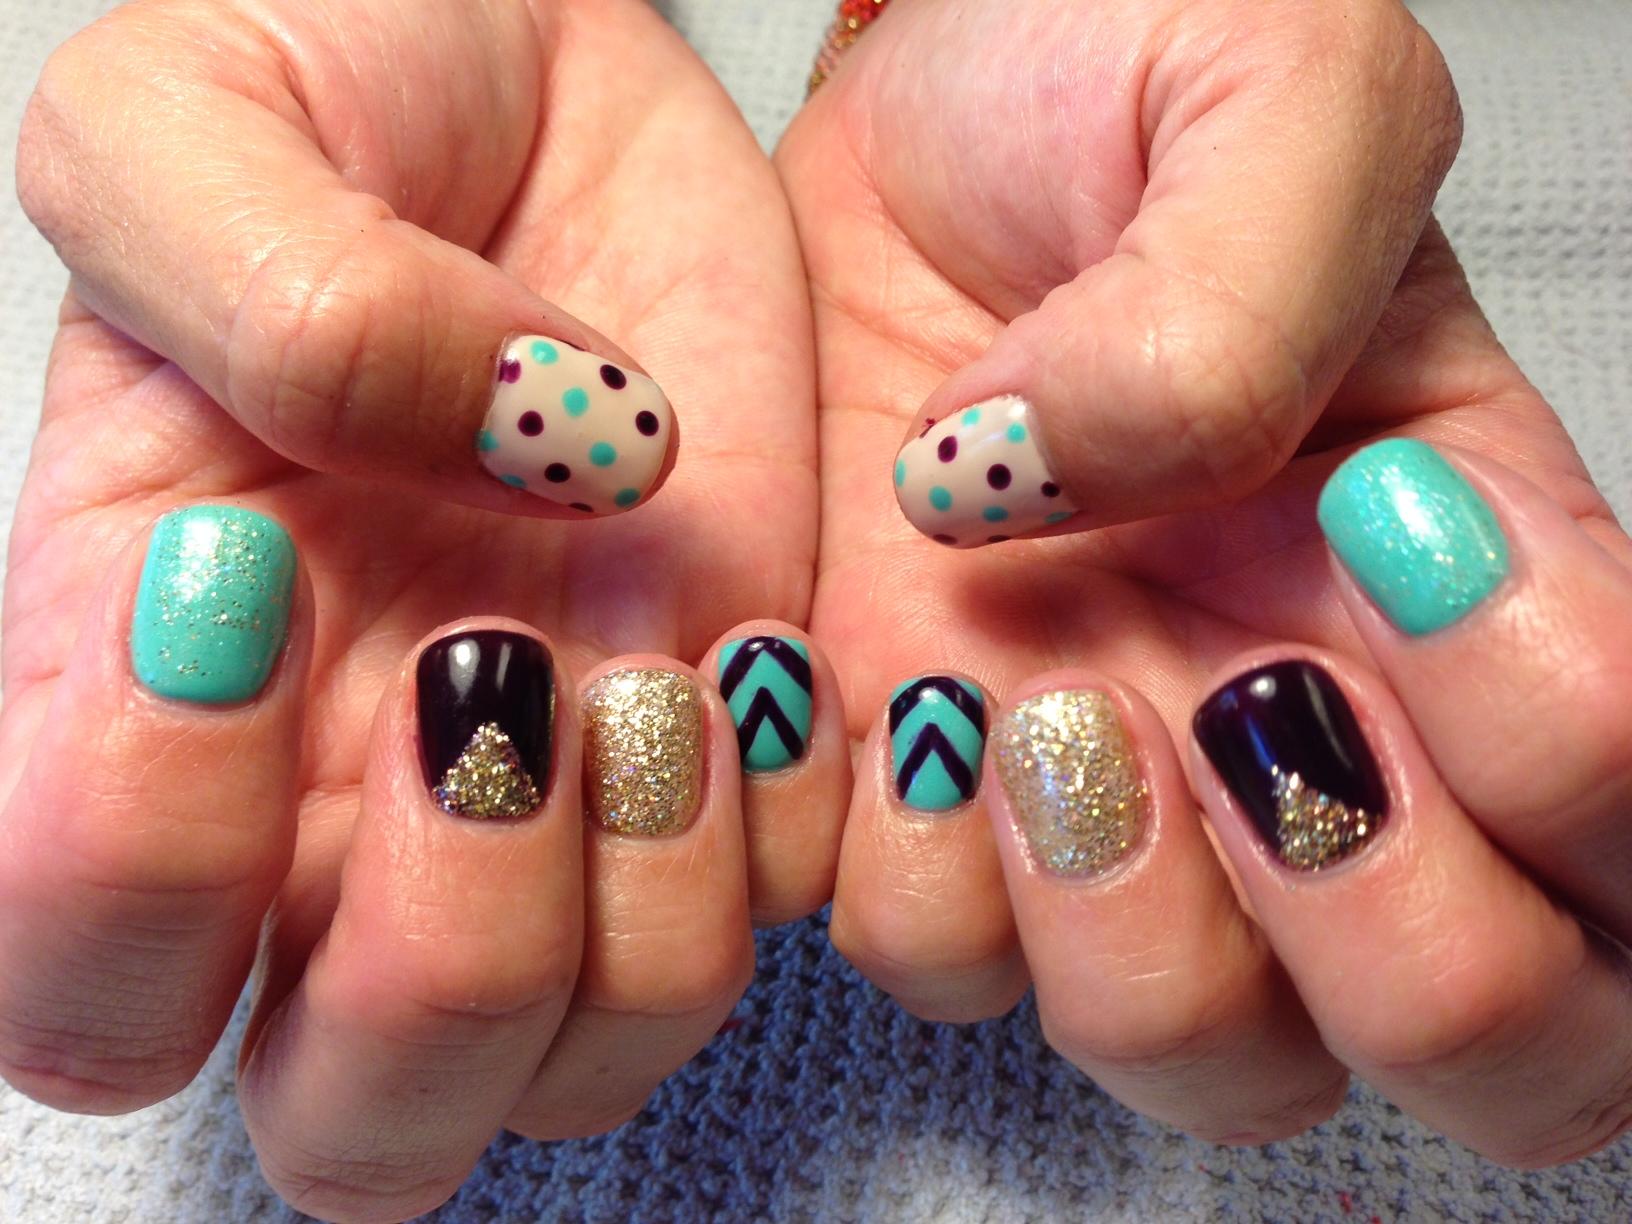 Nail designs together with wedding nail design free image nail art